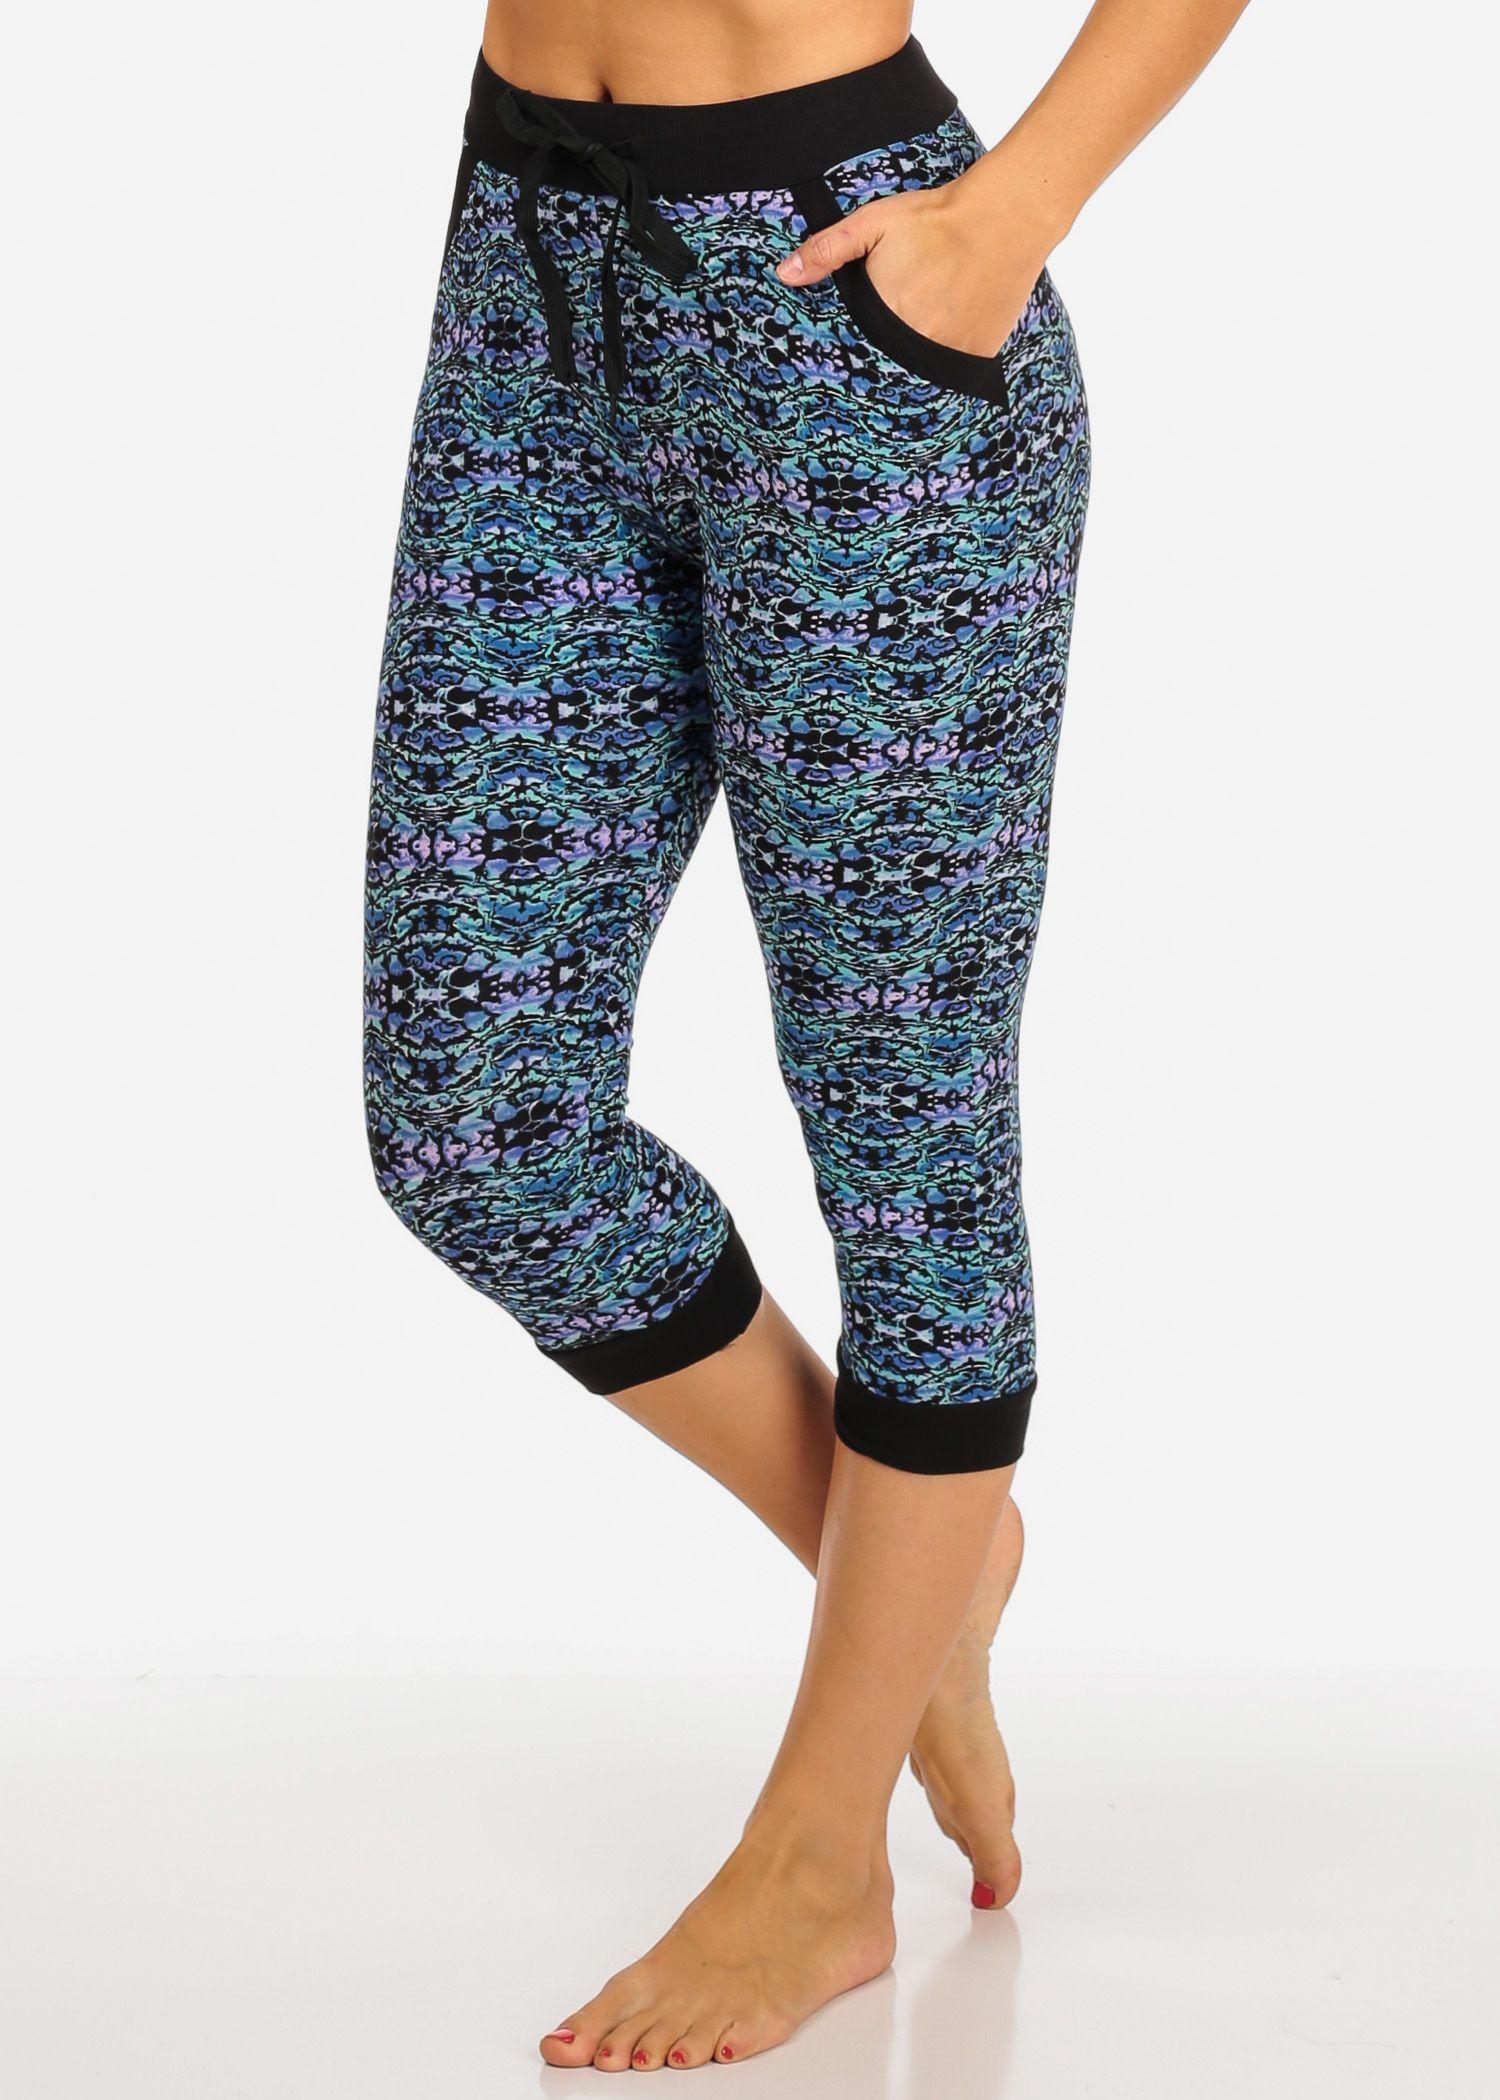 Women Joggers Pants Only At Onesizefits Com Joggers Womens